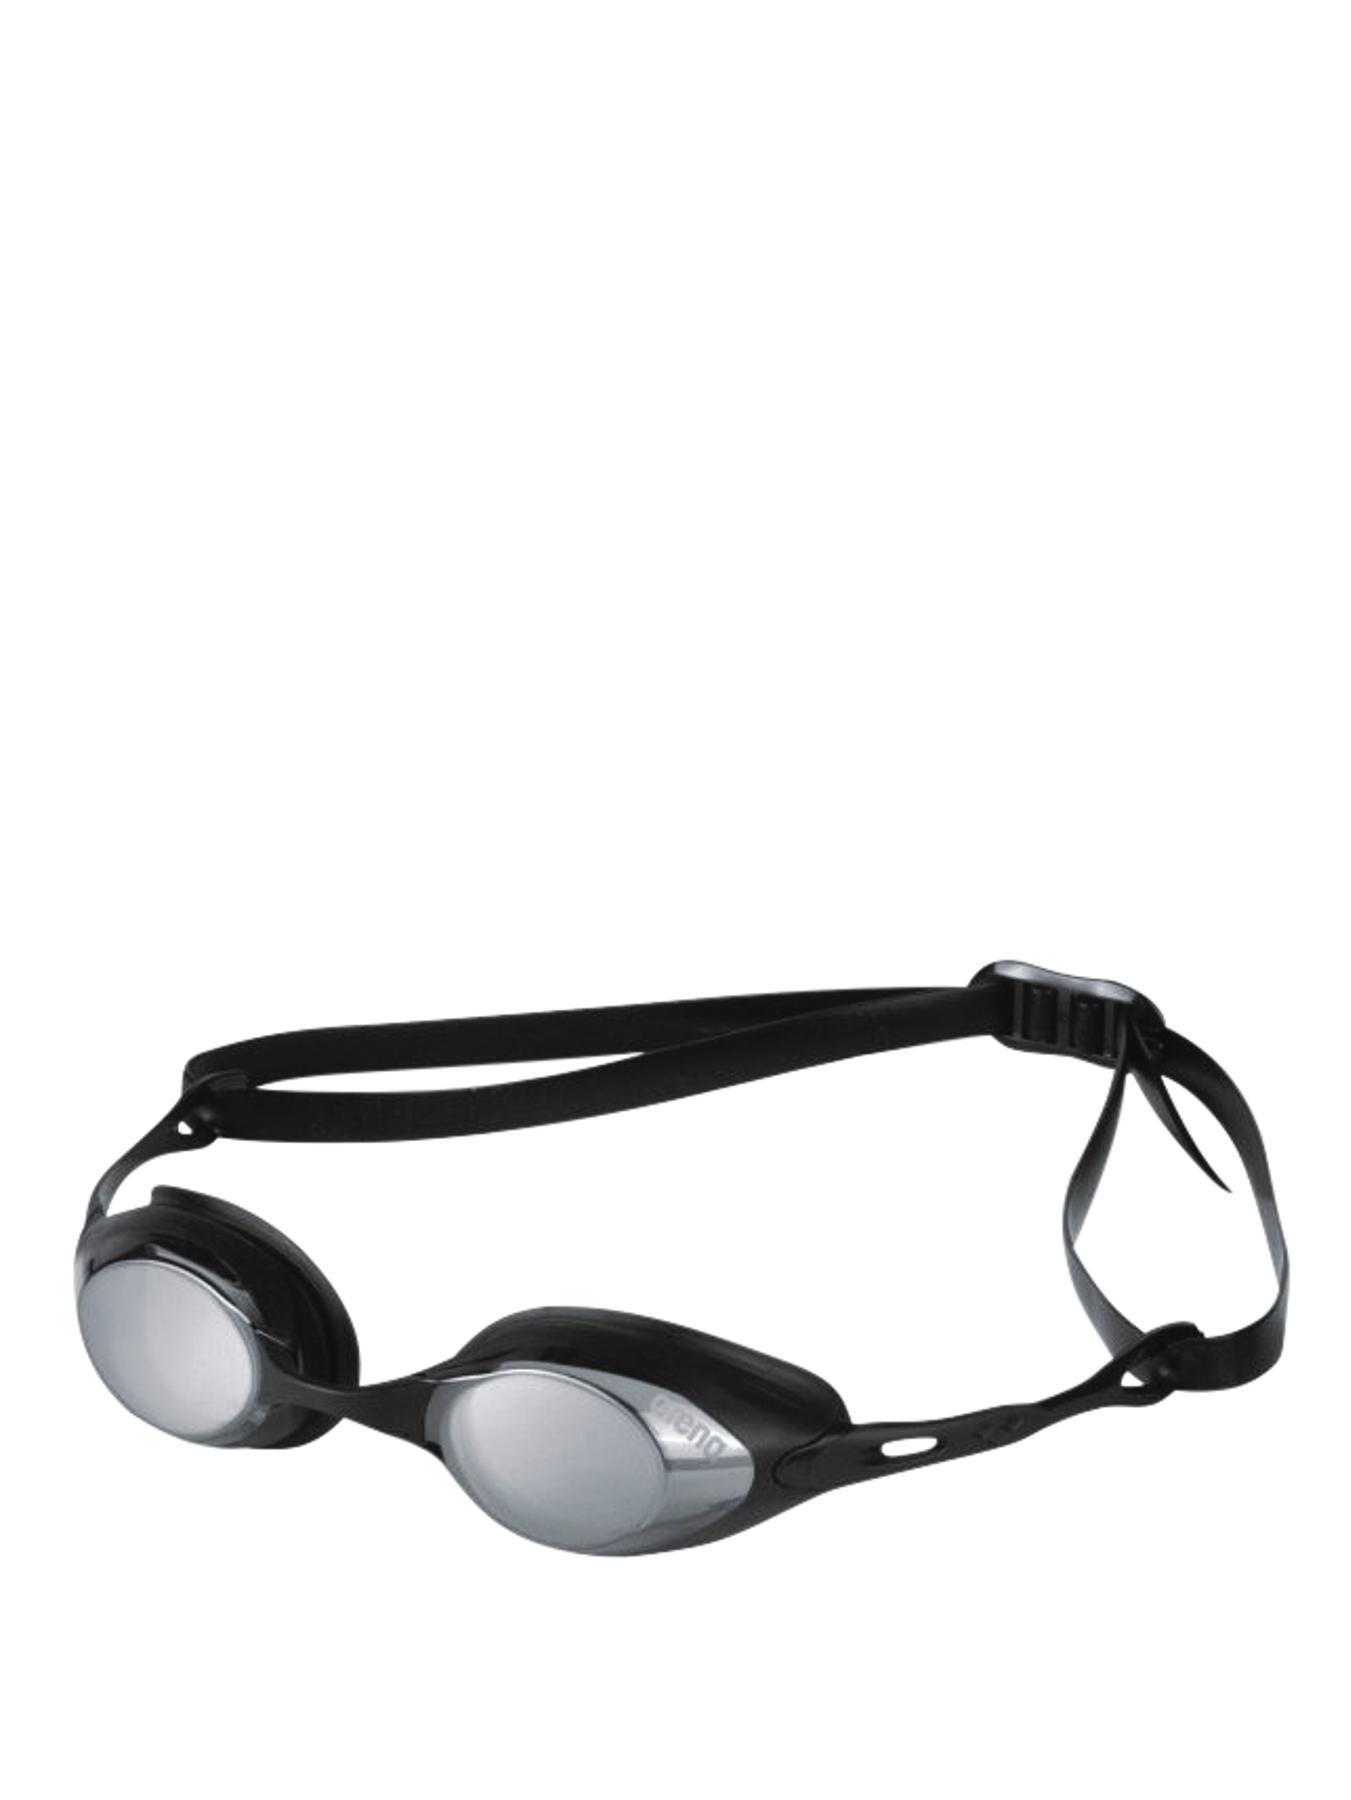 ARENA Cobra Mirror Goggles - Black, Black